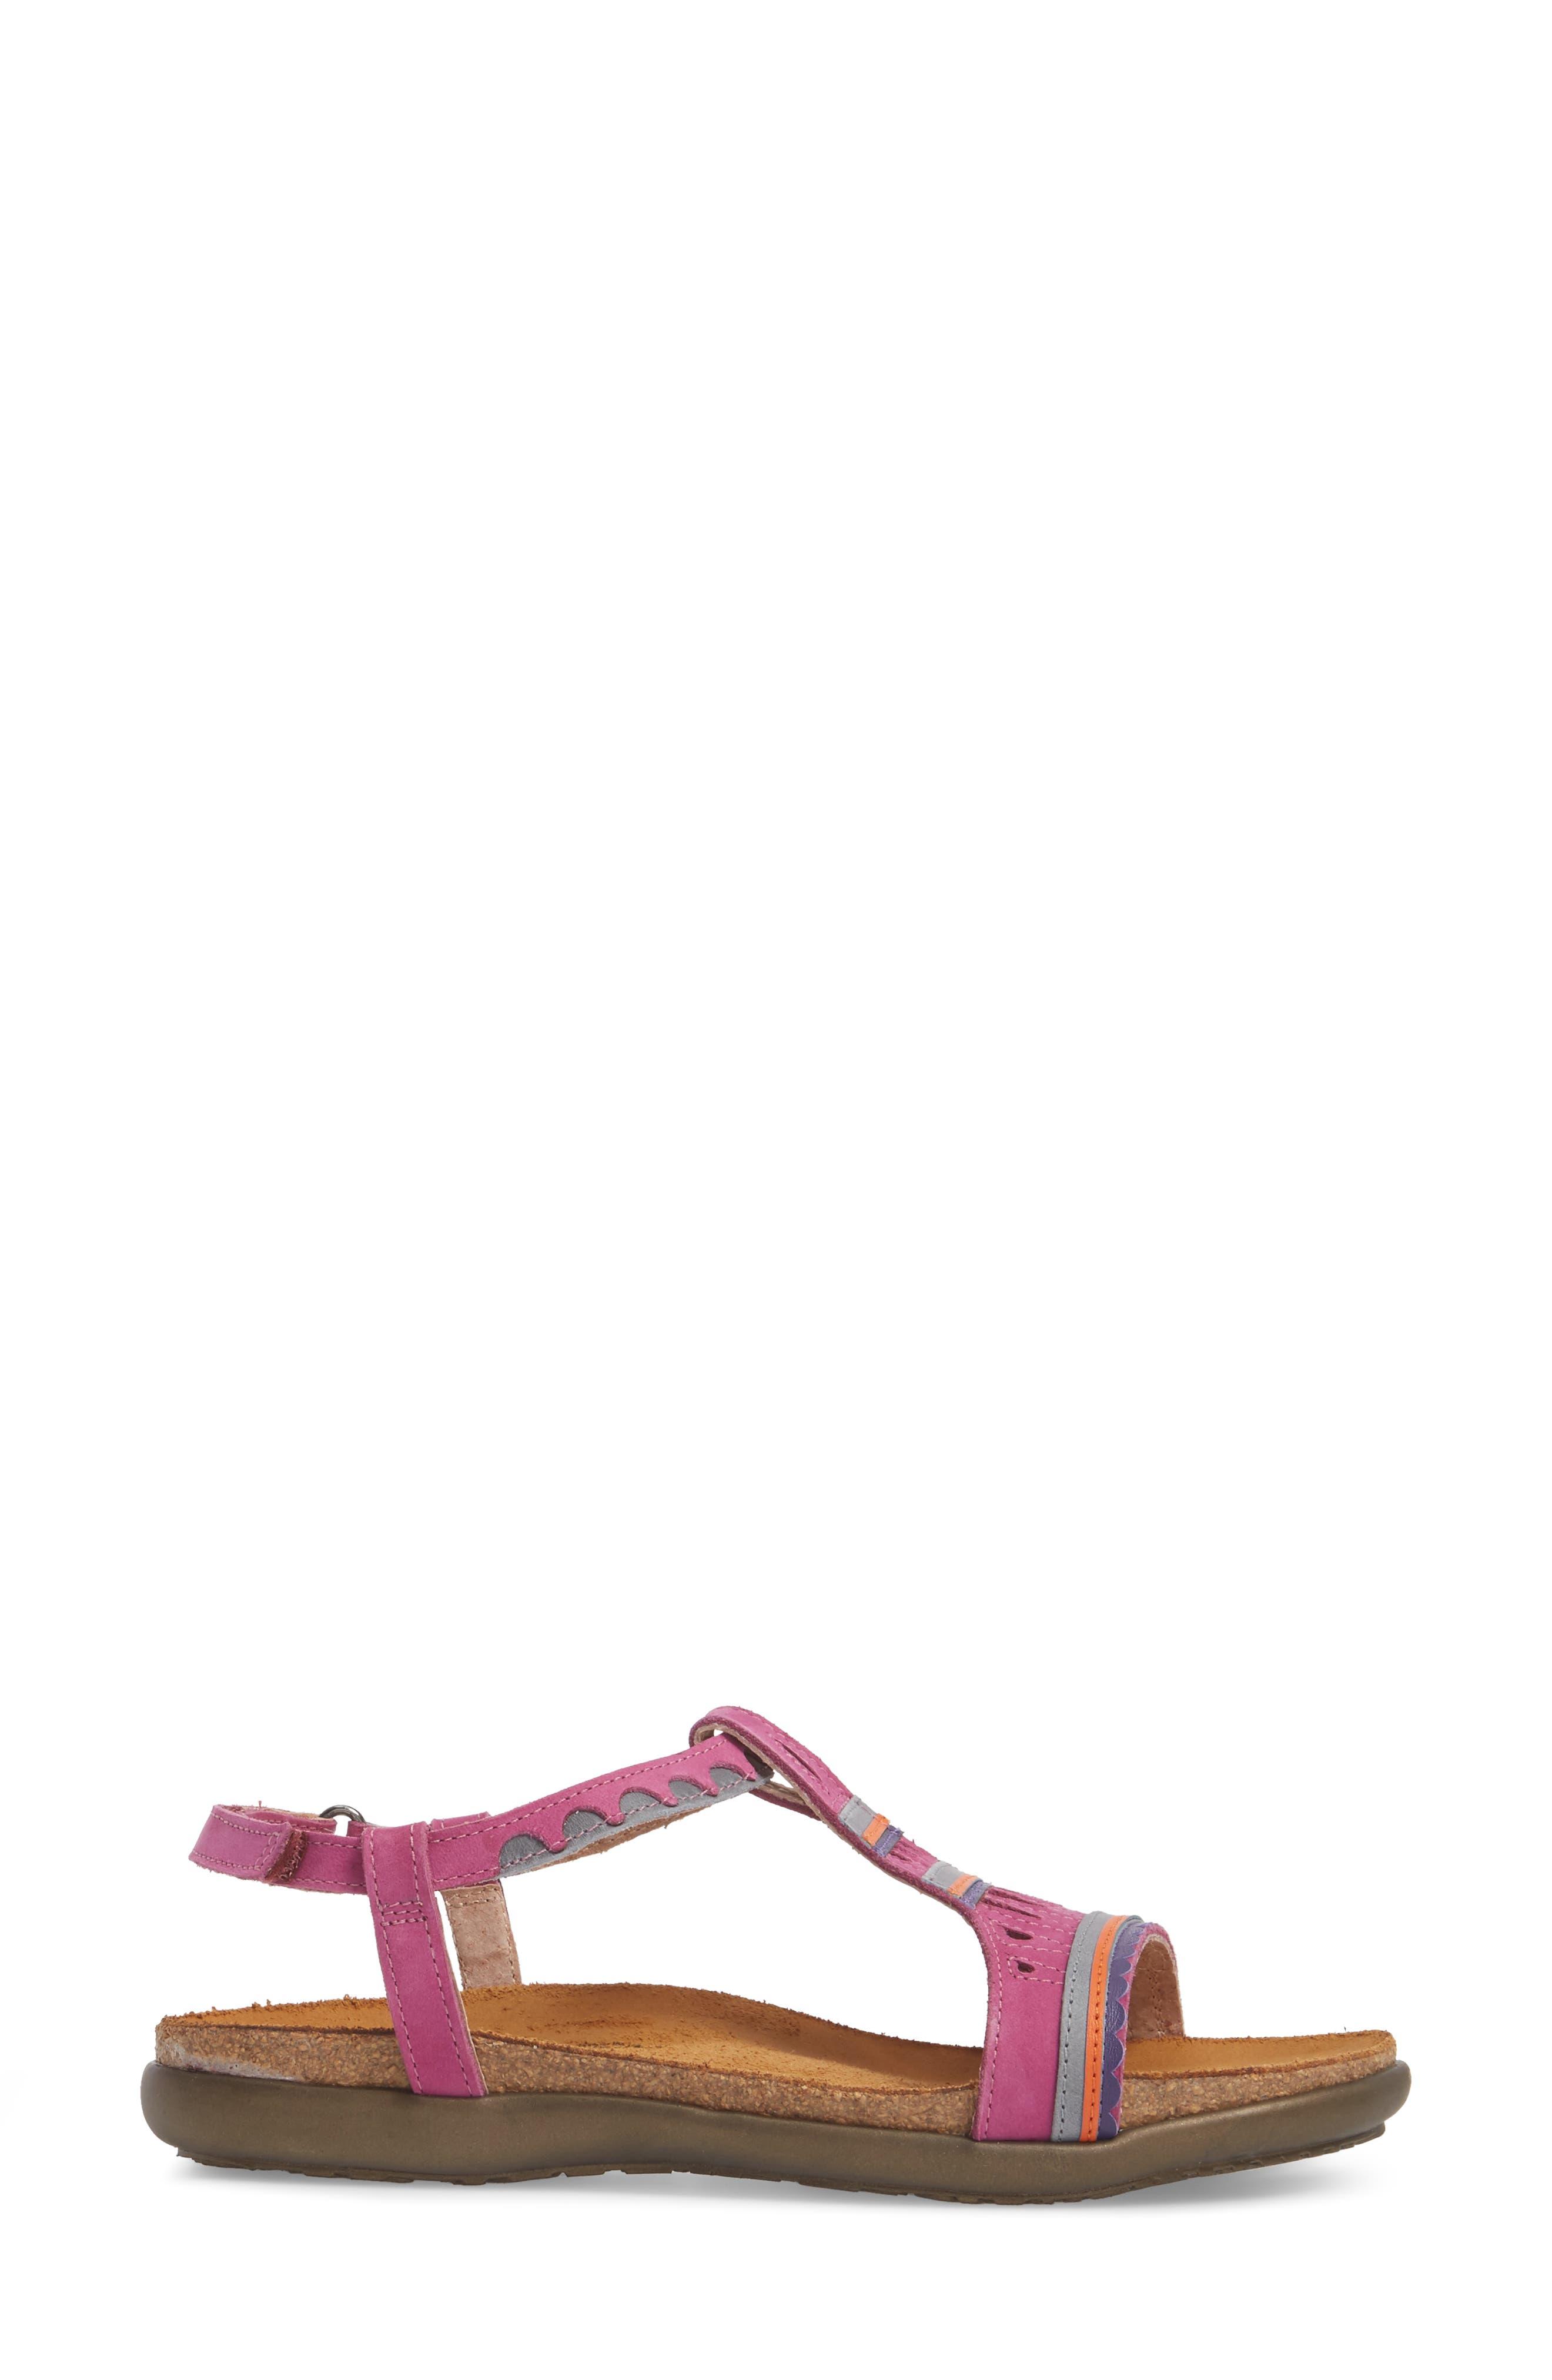 NAOT, Odelia Perforated T-Strap Sandal, Alternate thumbnail 3, color, PINK PLUM NUBUCK